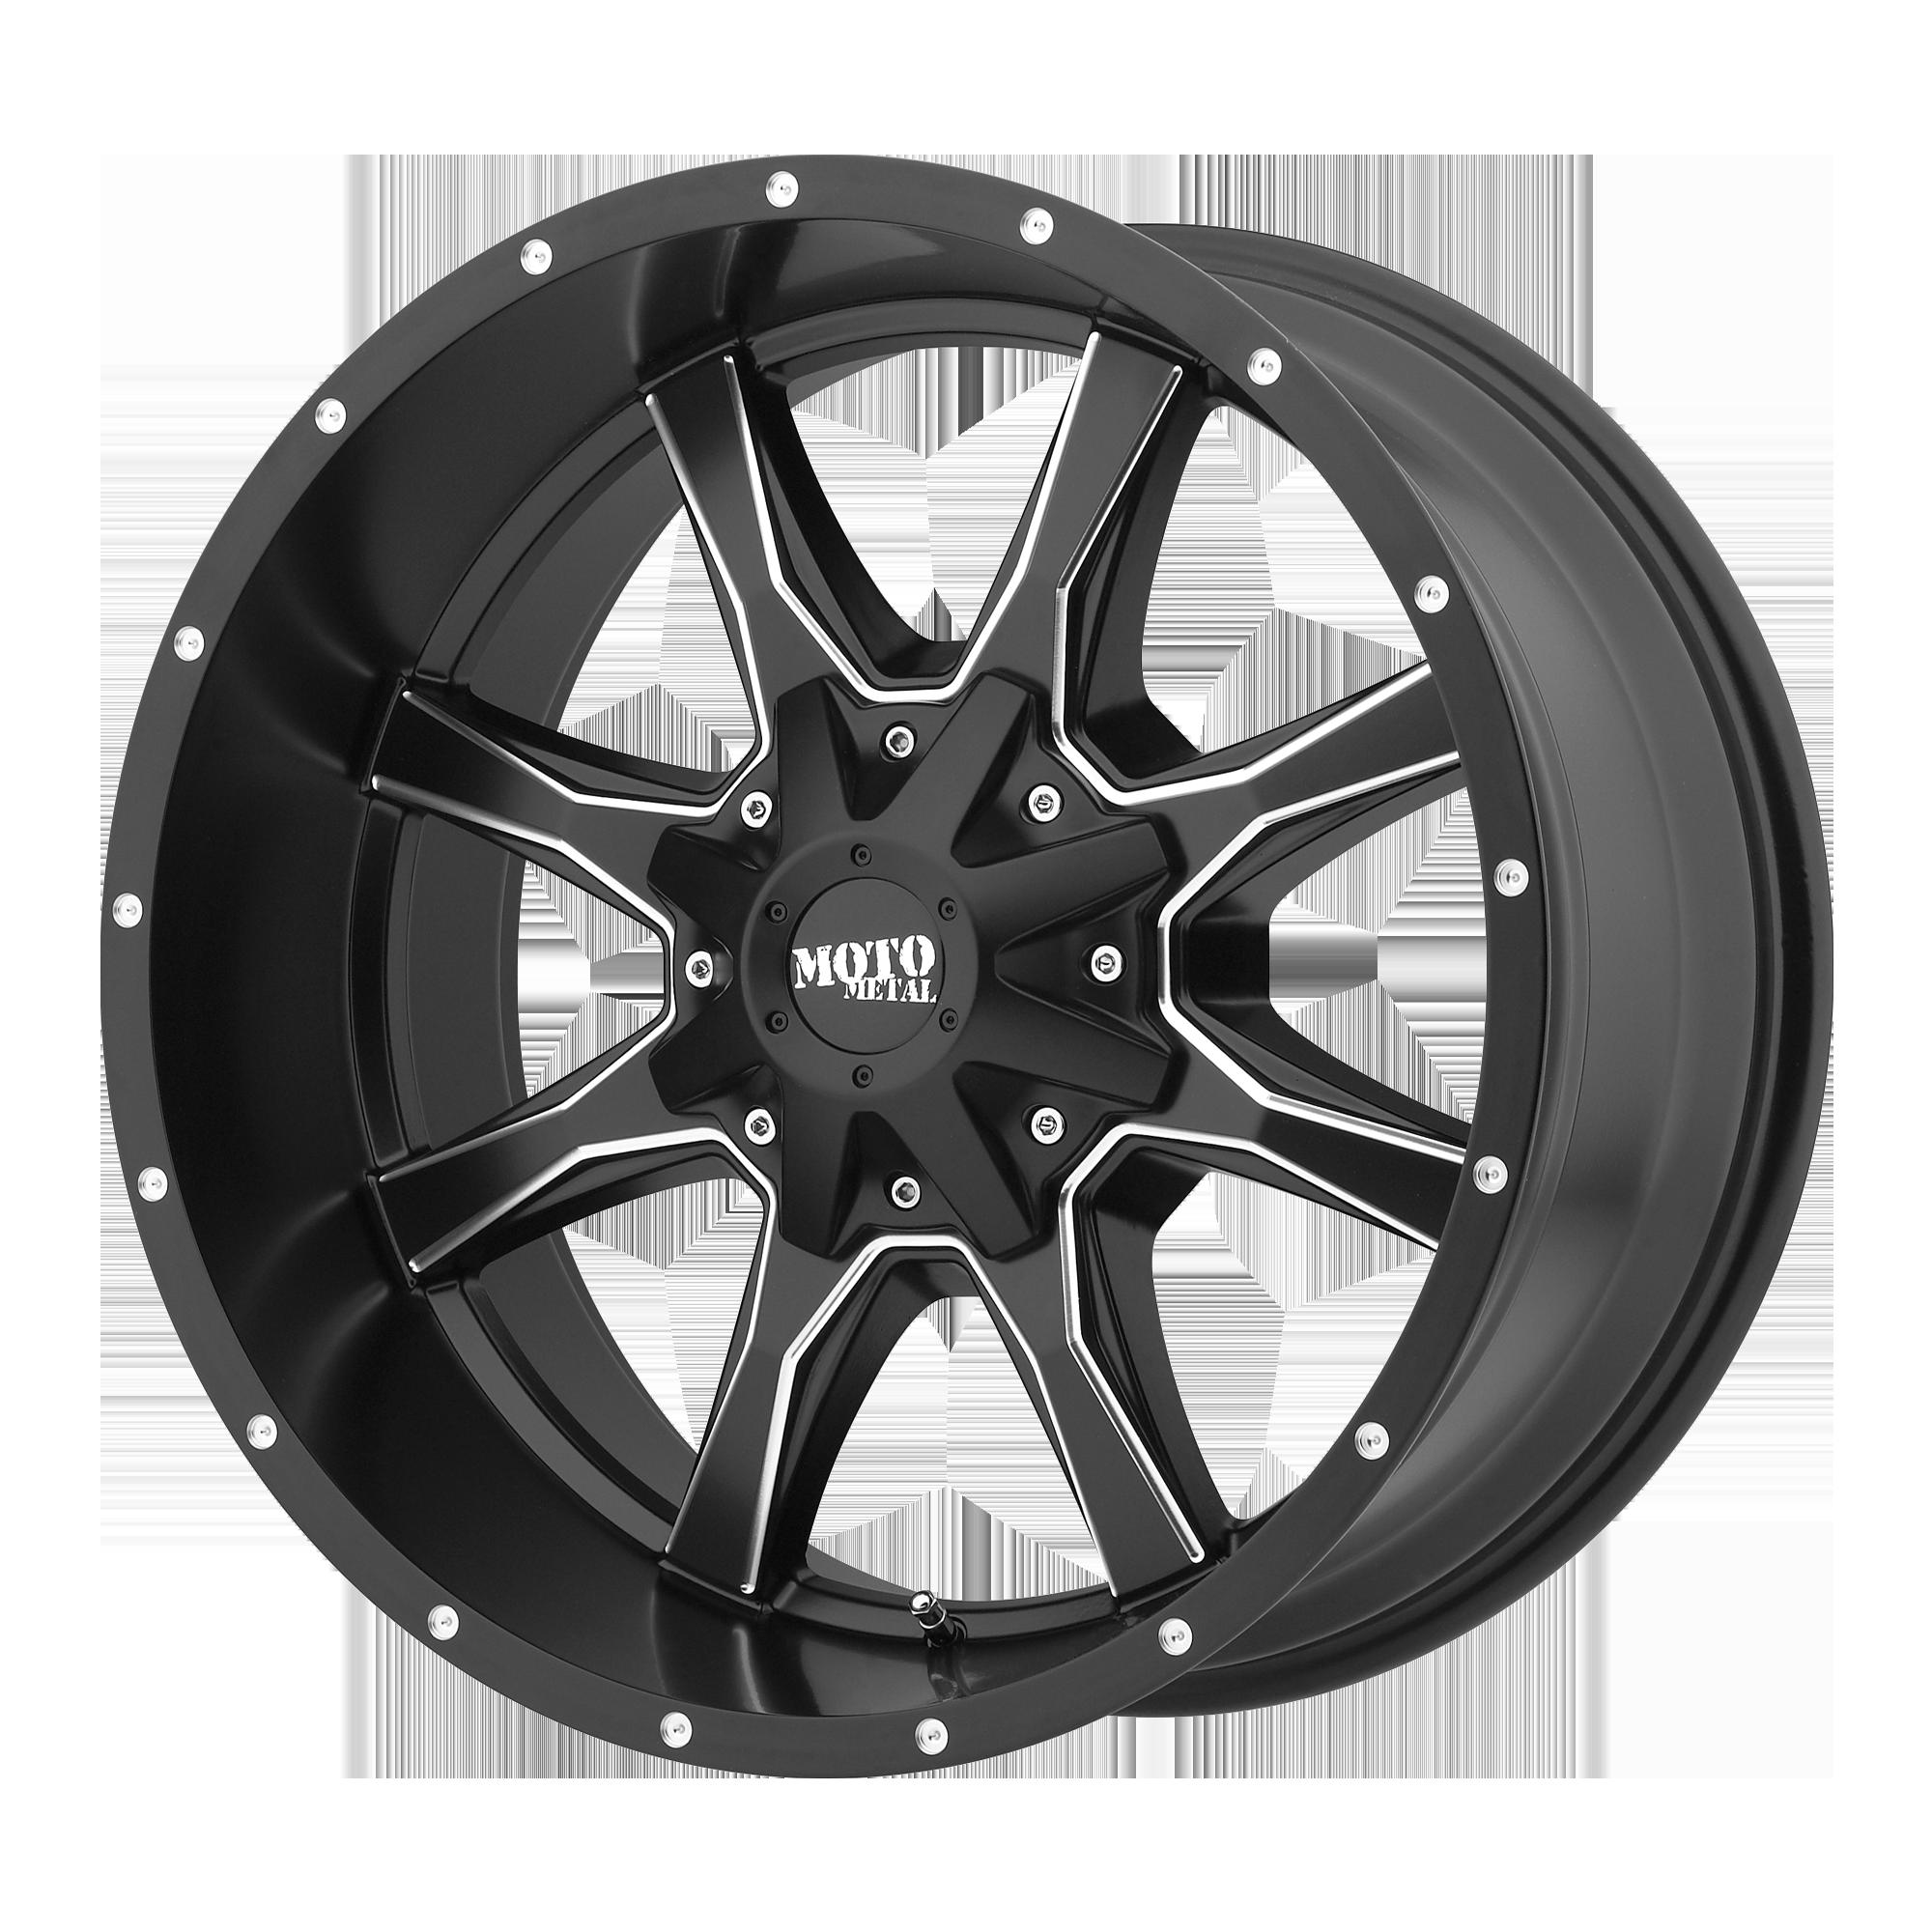 MOTO METAL MO970 hliníkové disky 10x20 8x165,1 ET-18 Satin Black Milled